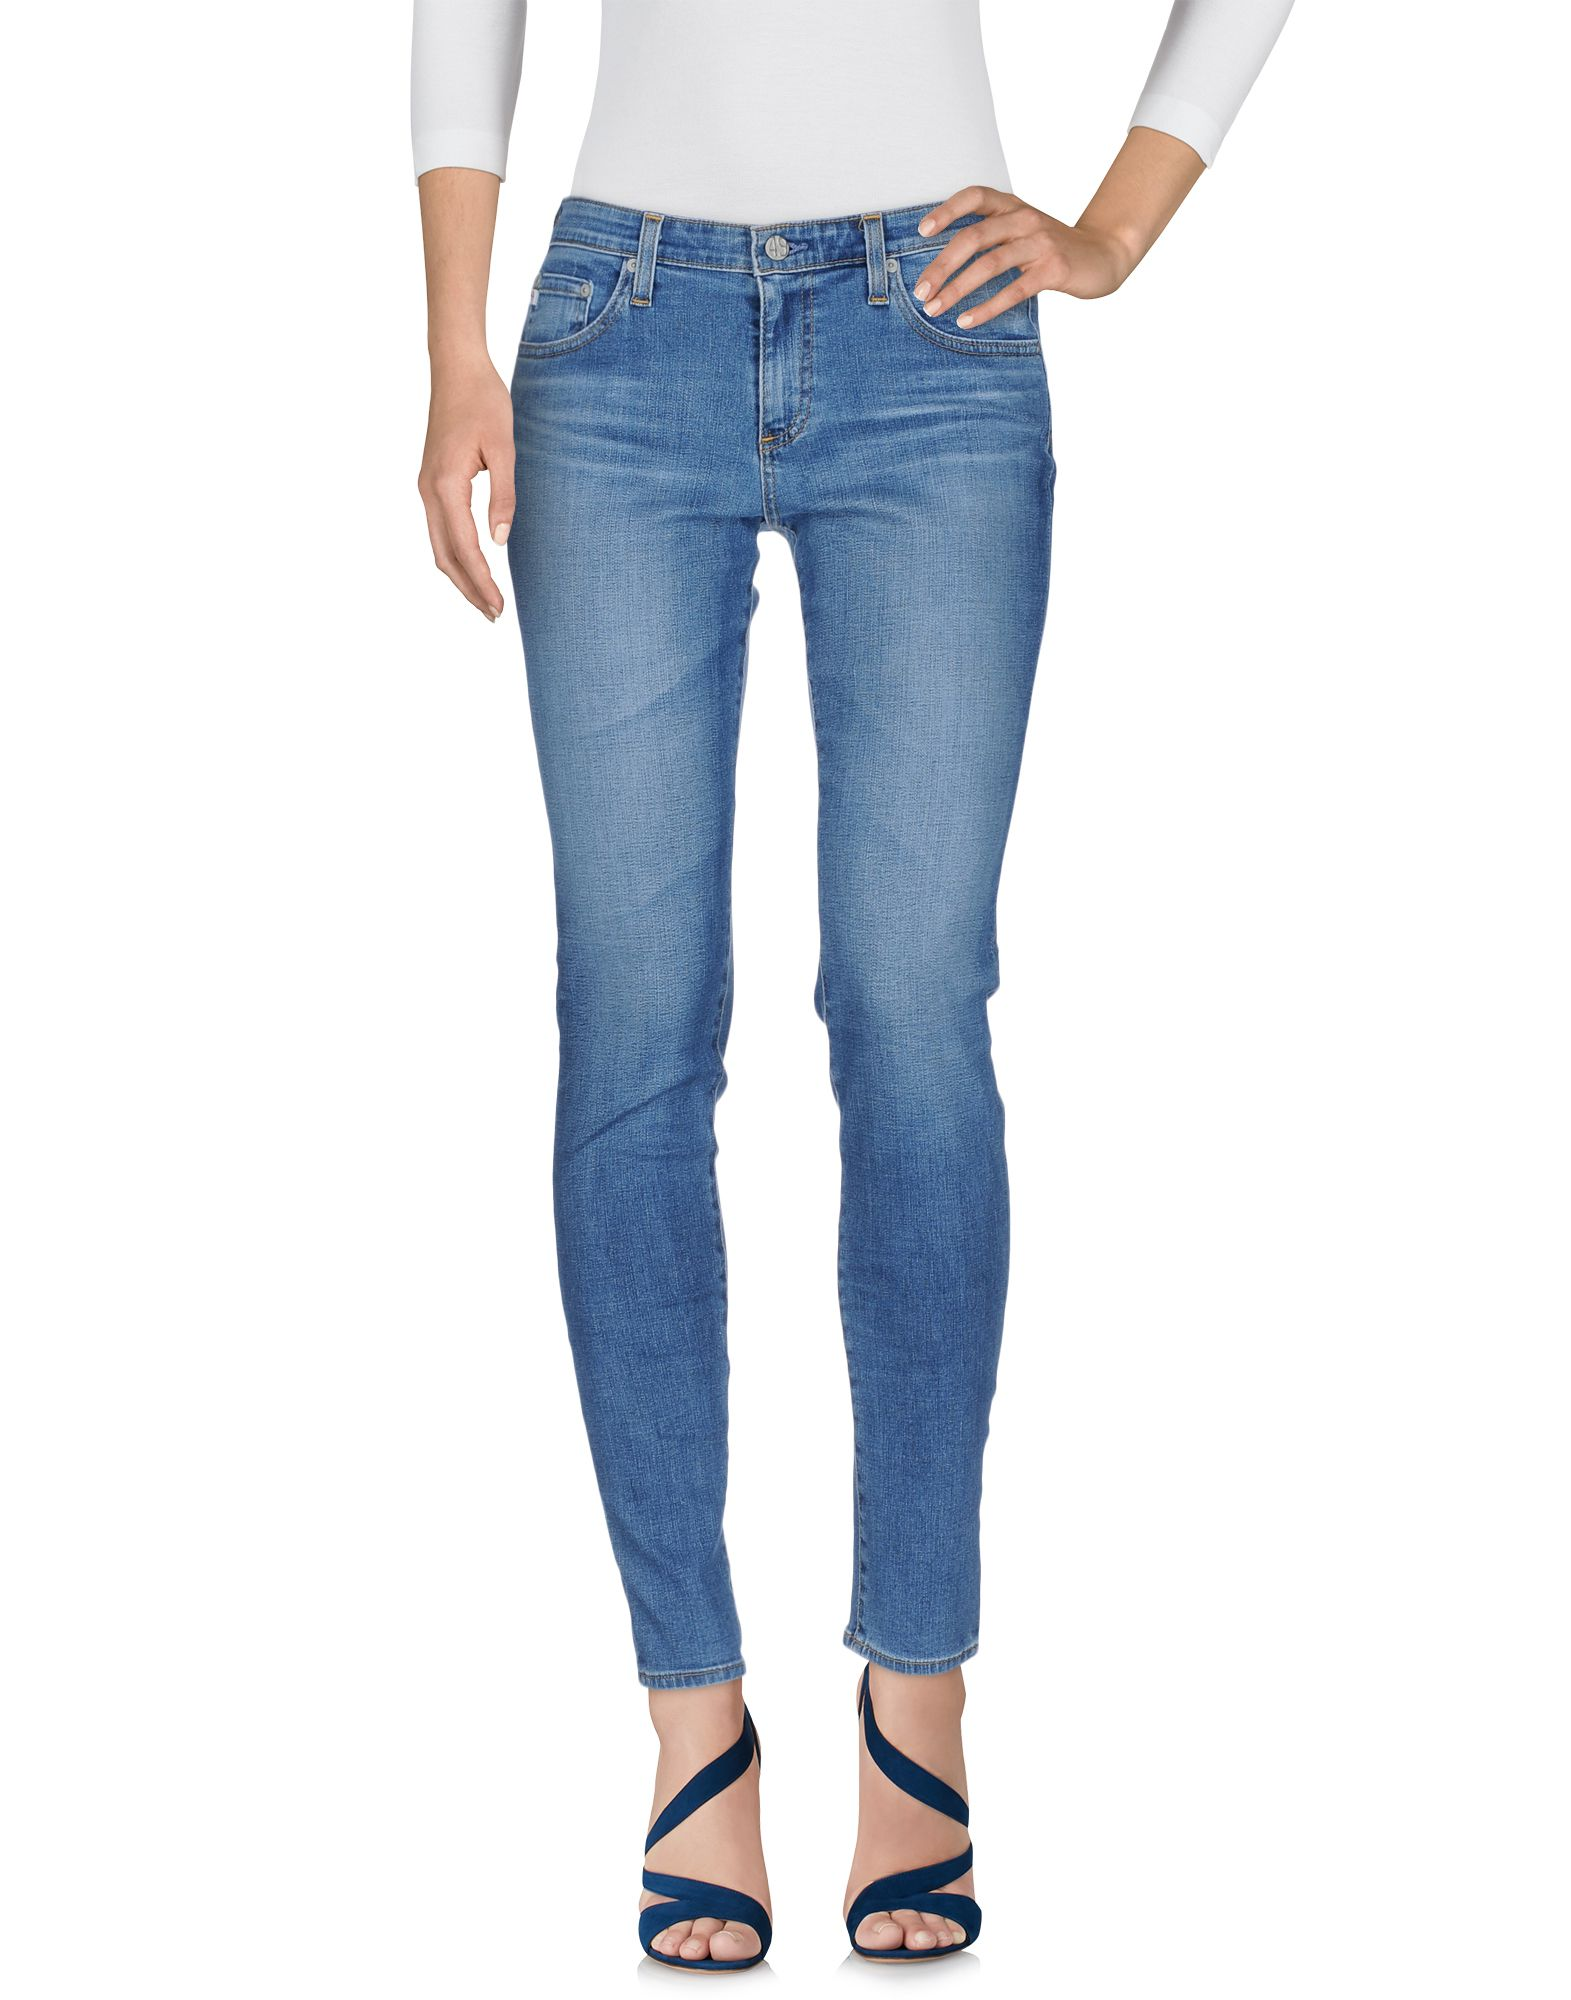 AG ADRIANO GOLDSCHMIED Damen Jeanshose Farbe Blau Größe 7 - broschei